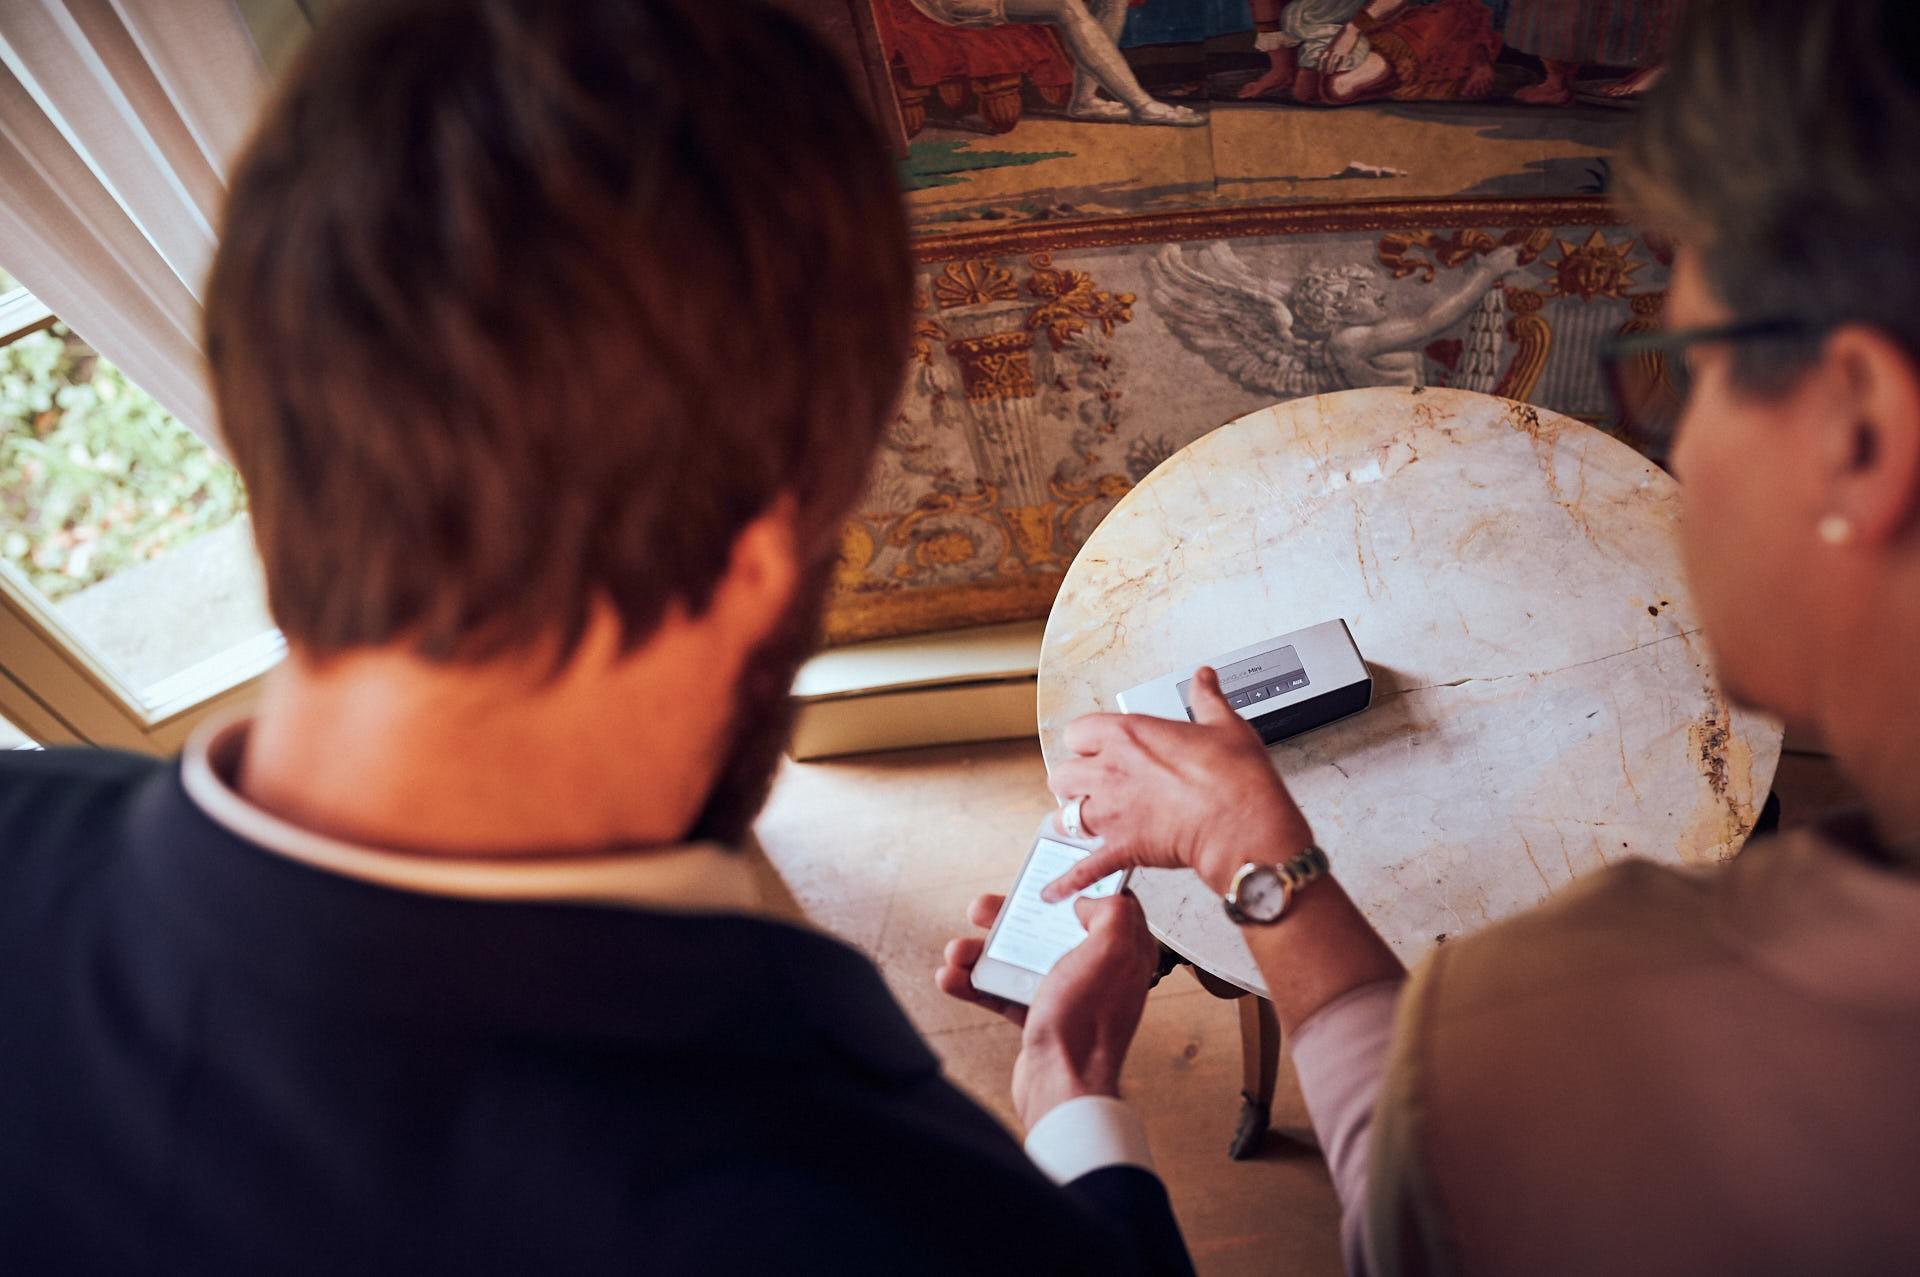 Bräutigam sucht Musik aus